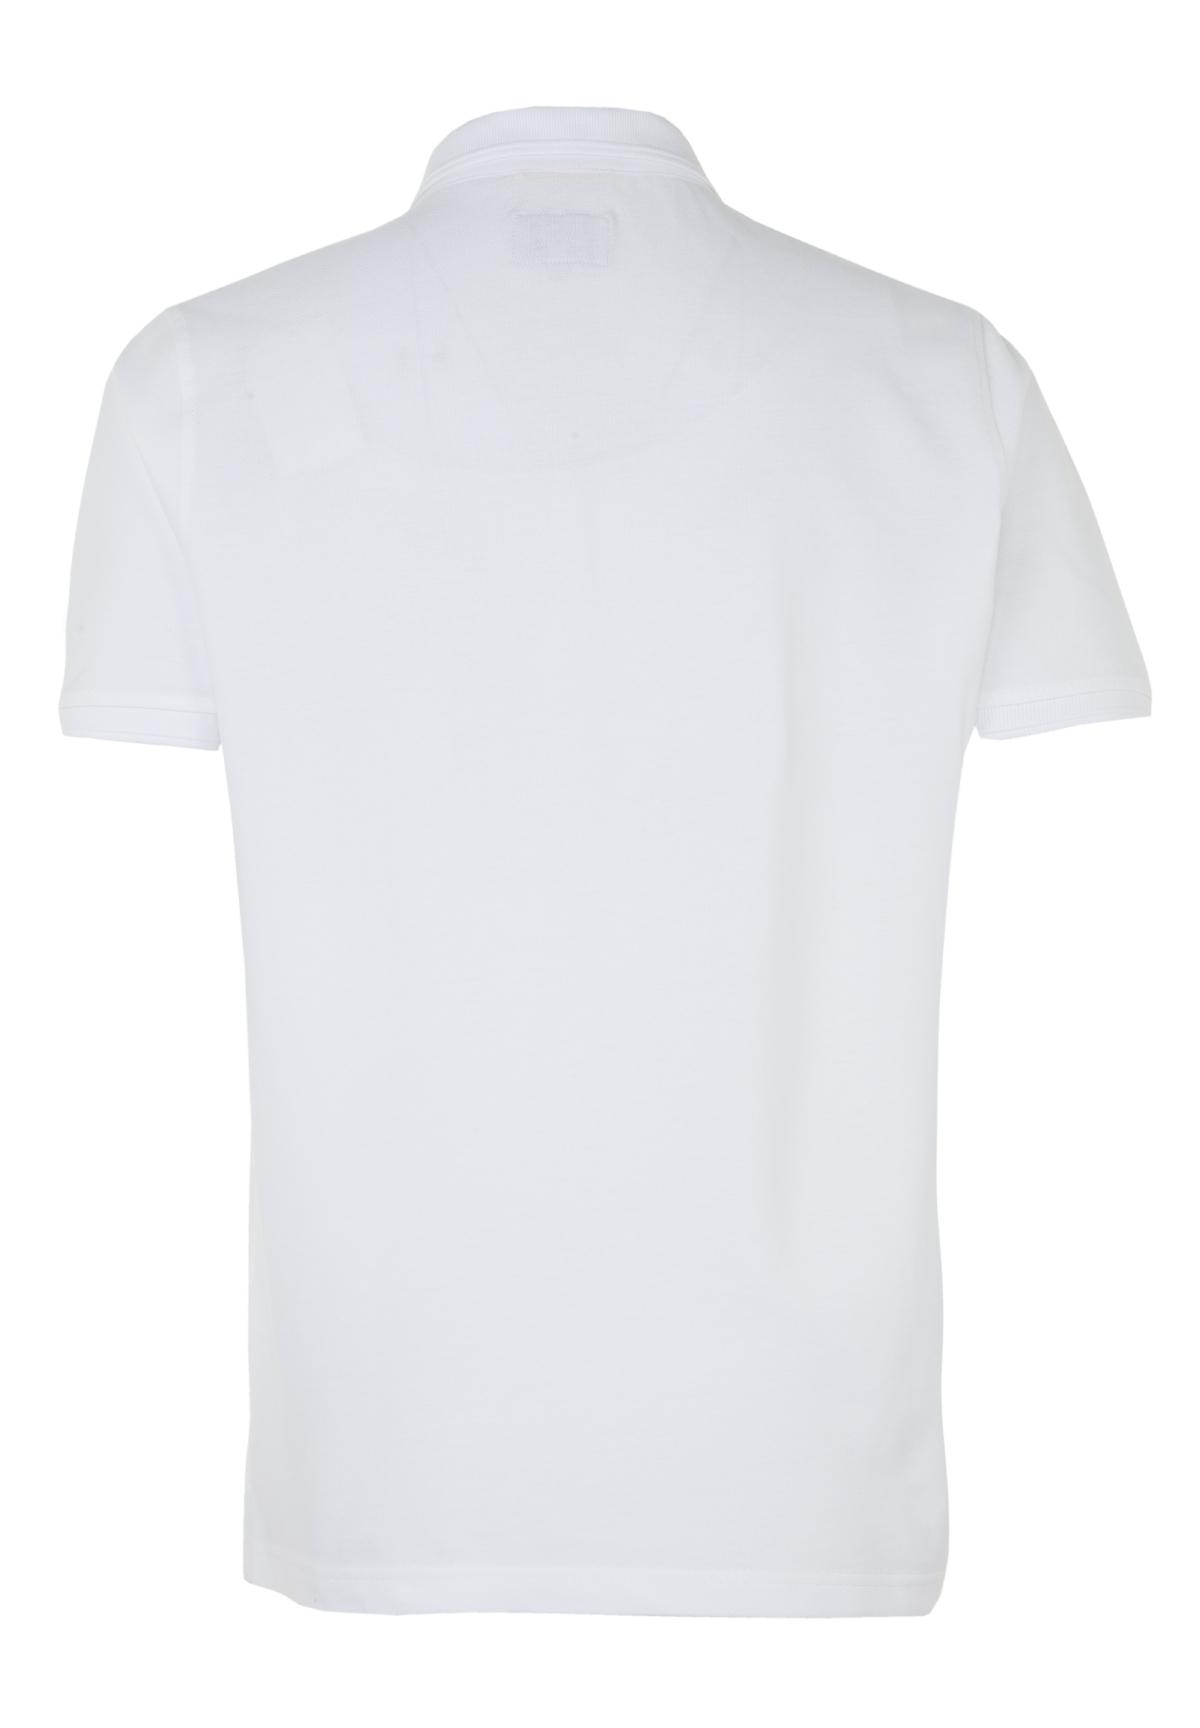 Camel-Active-Herren-Shirt-Poloshirt-Pique-Regular-Fit-NEU Indexbild 3